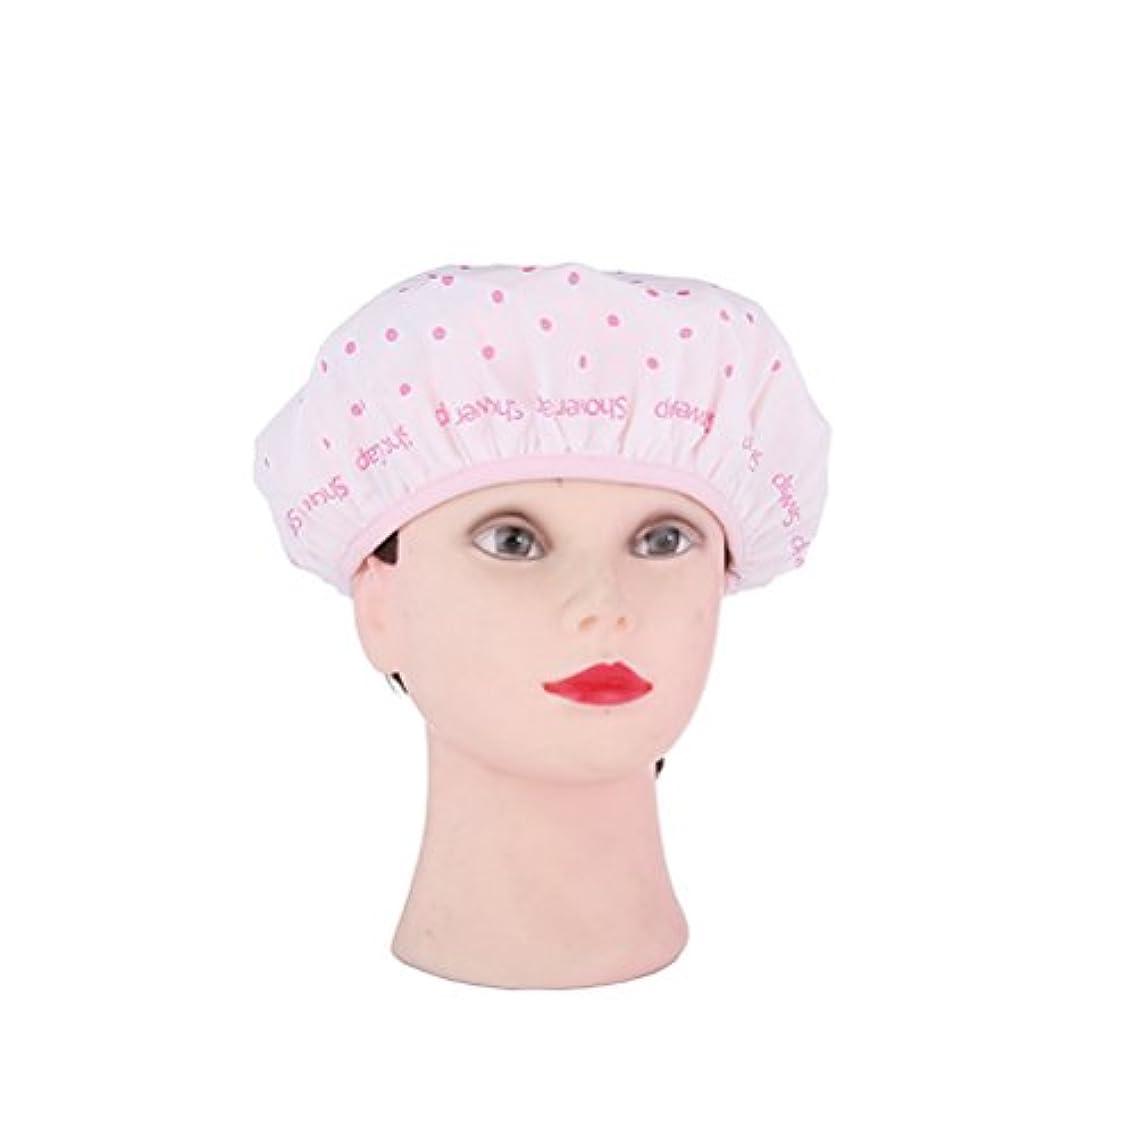 HEALLILY シャワーの帽子女性の子供のための防水シャワーの帽子のBathのシャワーの毛の帽子